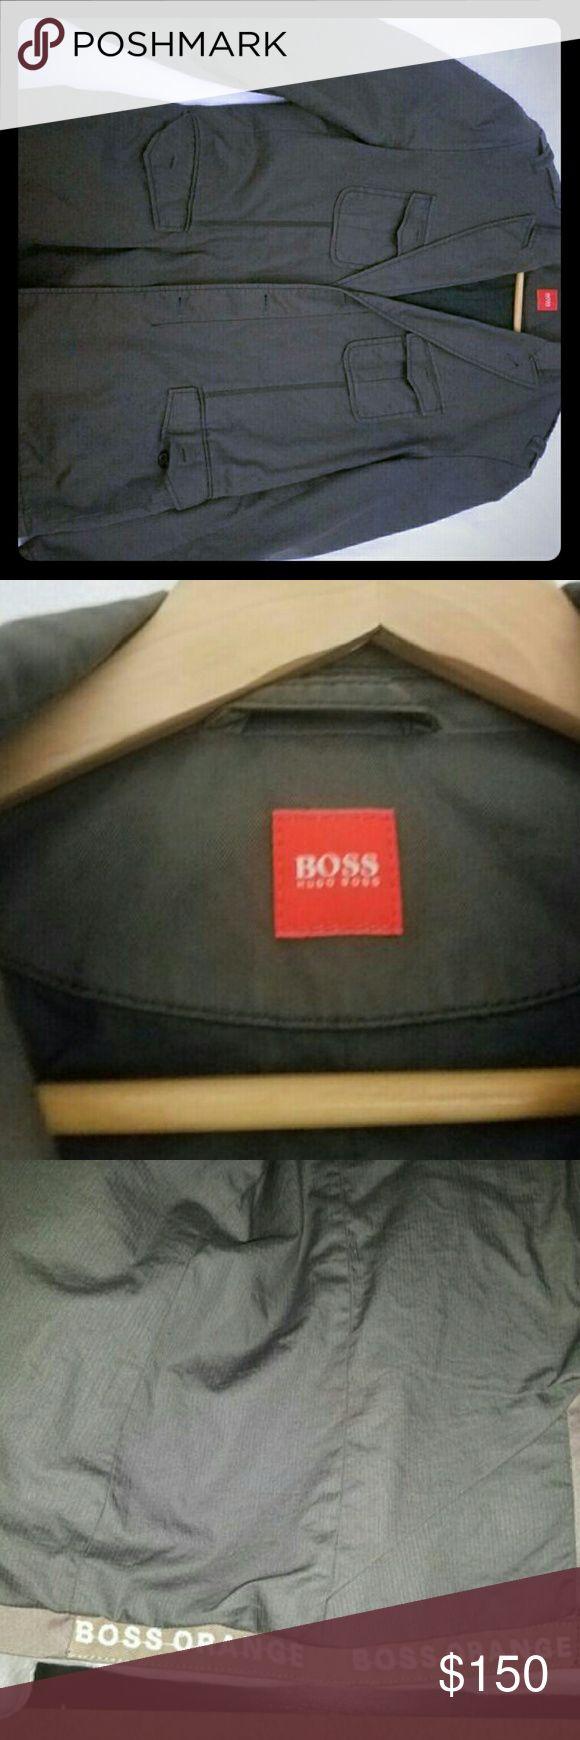 Hugo Boss Orange label jacket Hugo Boss jacket  Orange Label  Size 42R (L) NEW NEVER USED Hugo Boss Suits & Blazers Sport Coats & Blazers